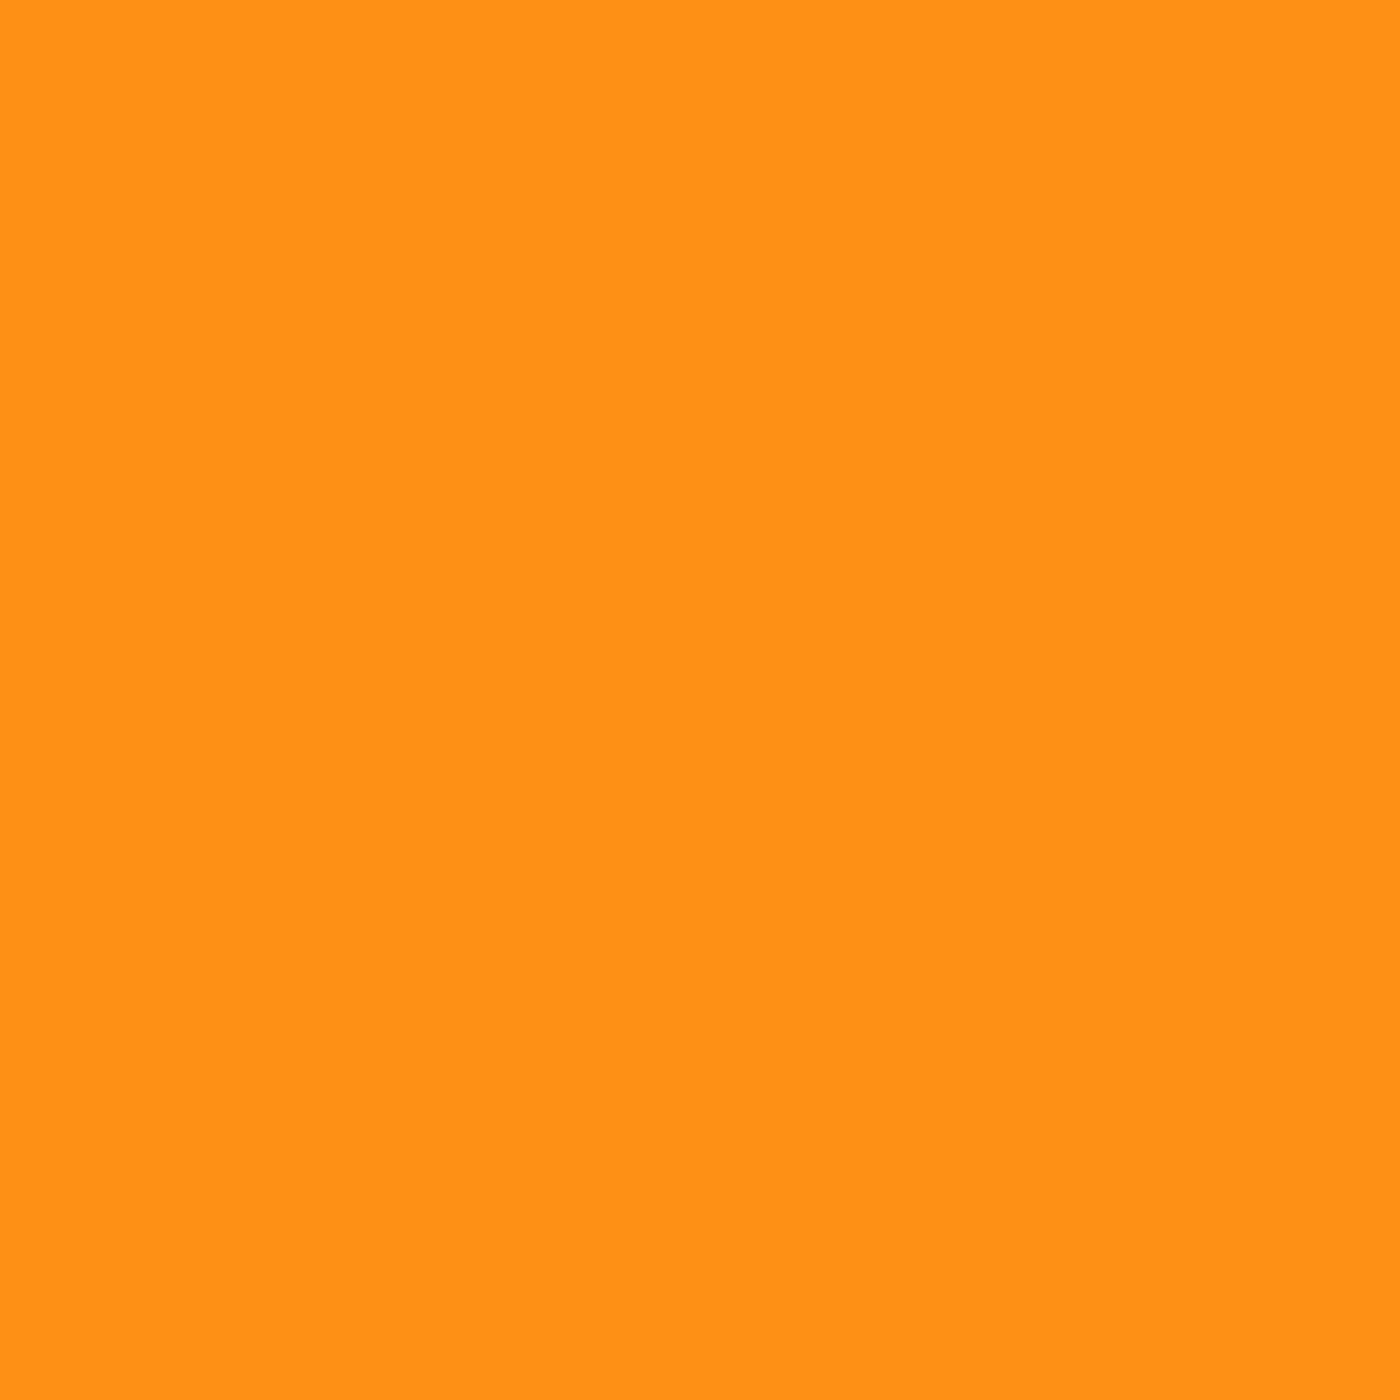 Risk Orange